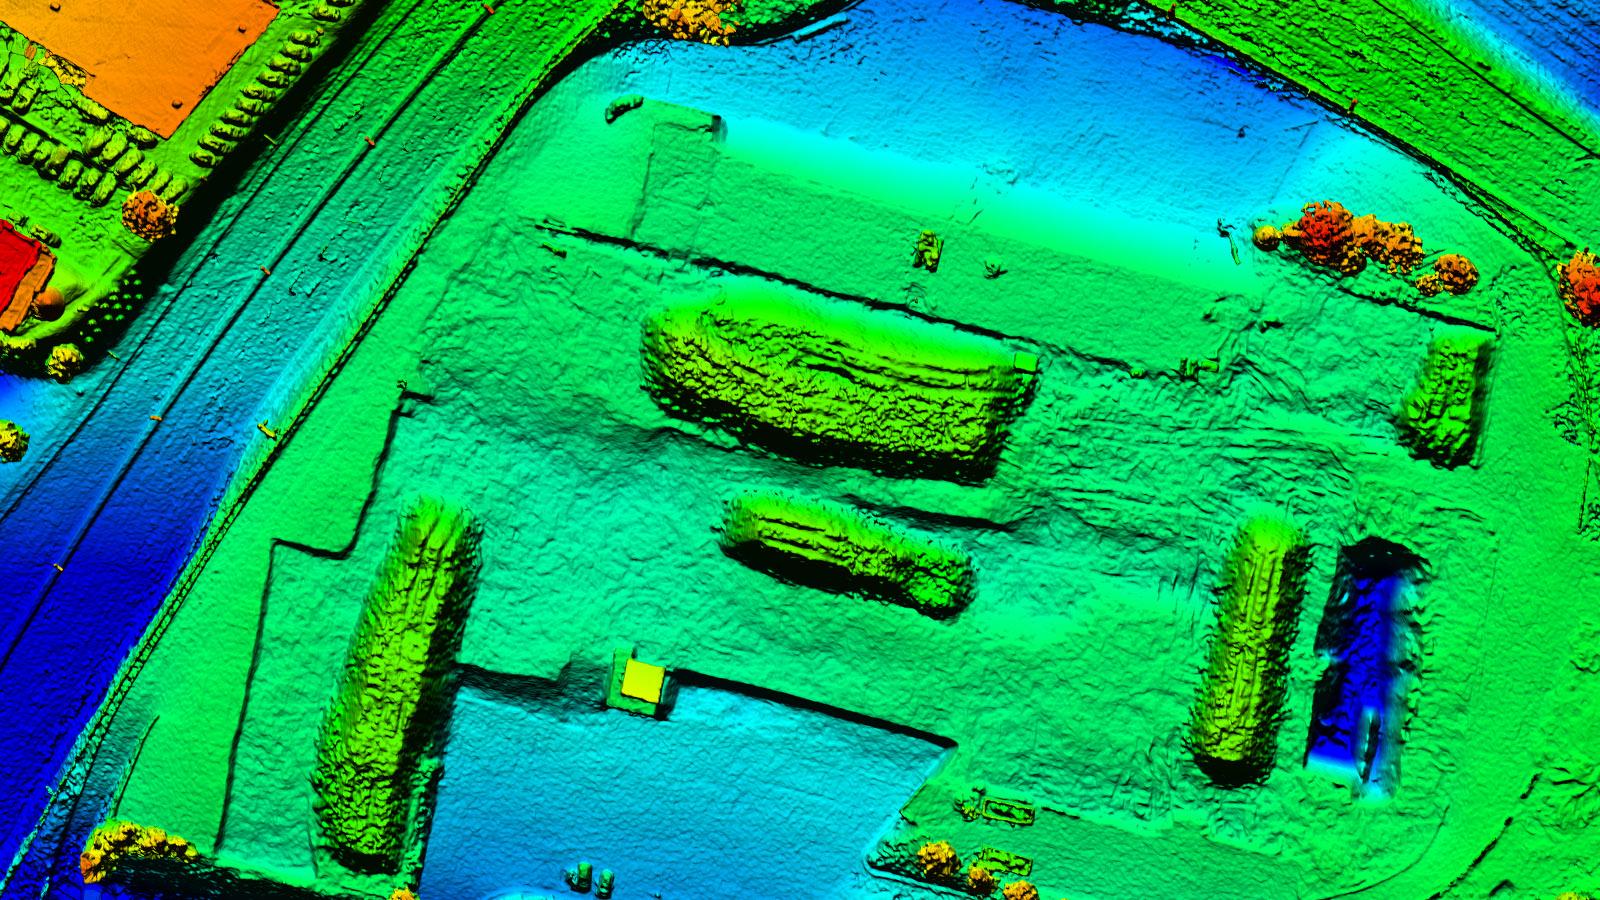 Pix4Dbim outputs Digital surface model